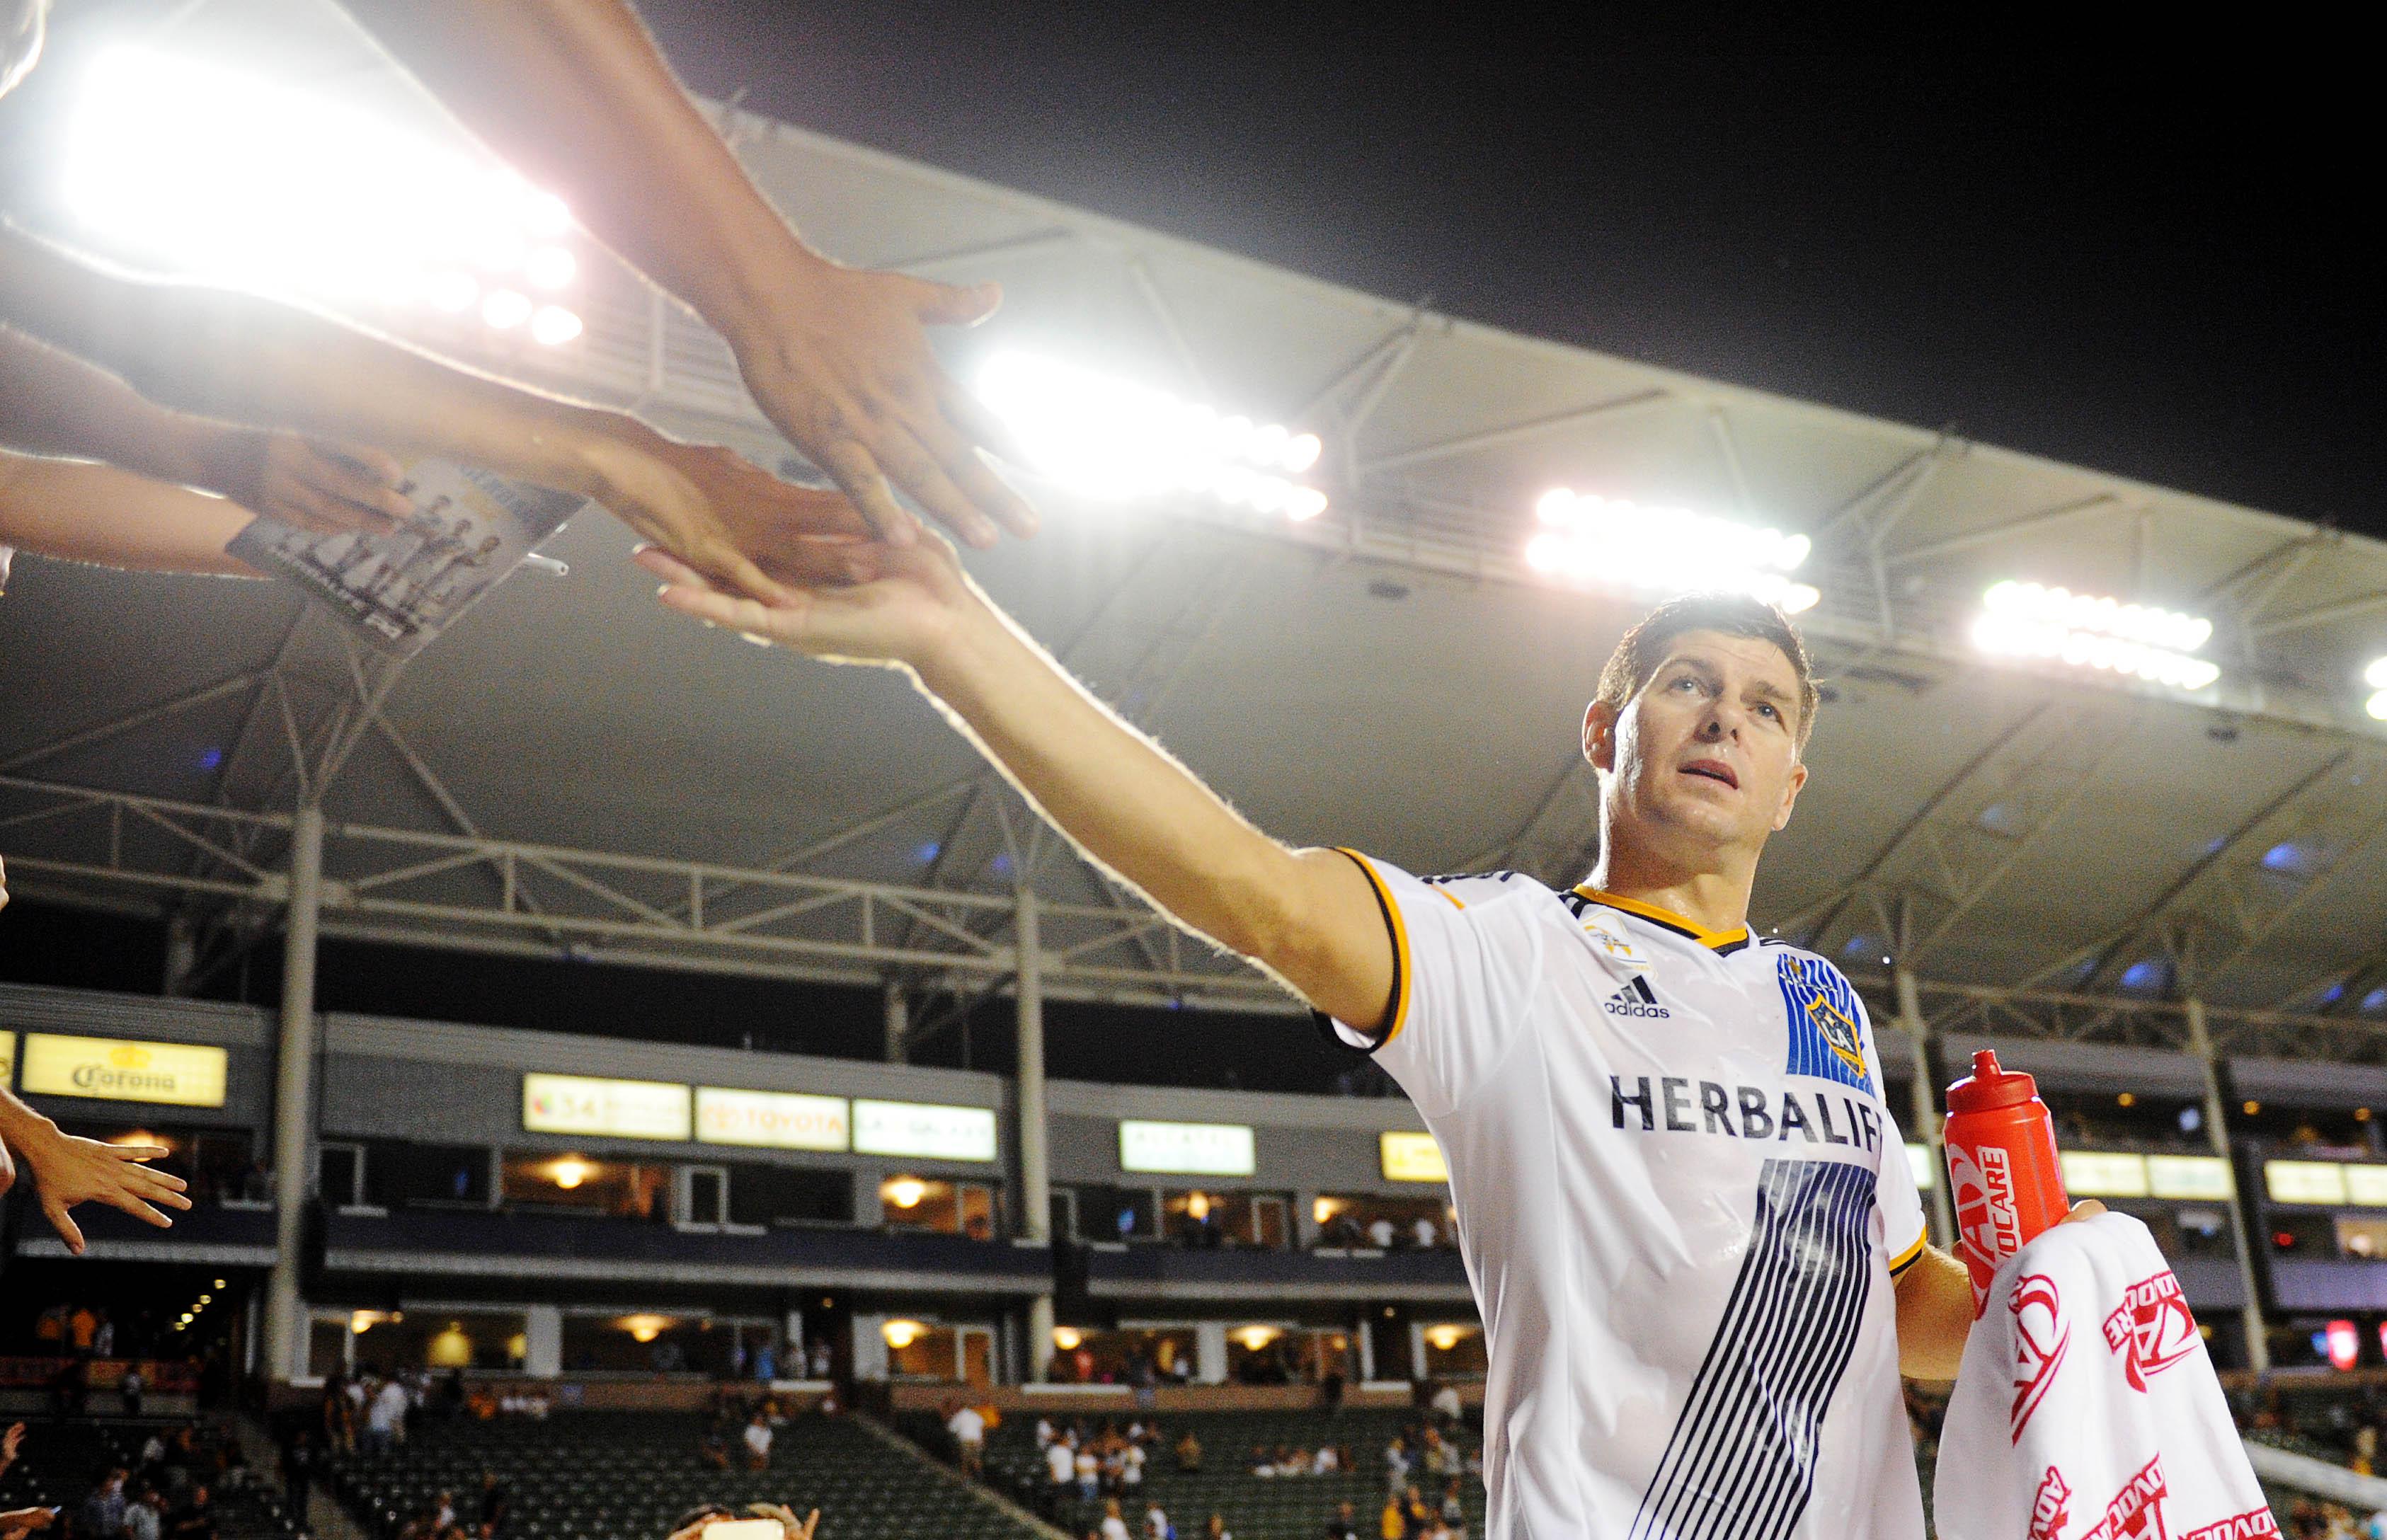 Steven Gerrard LA Galaxy 17